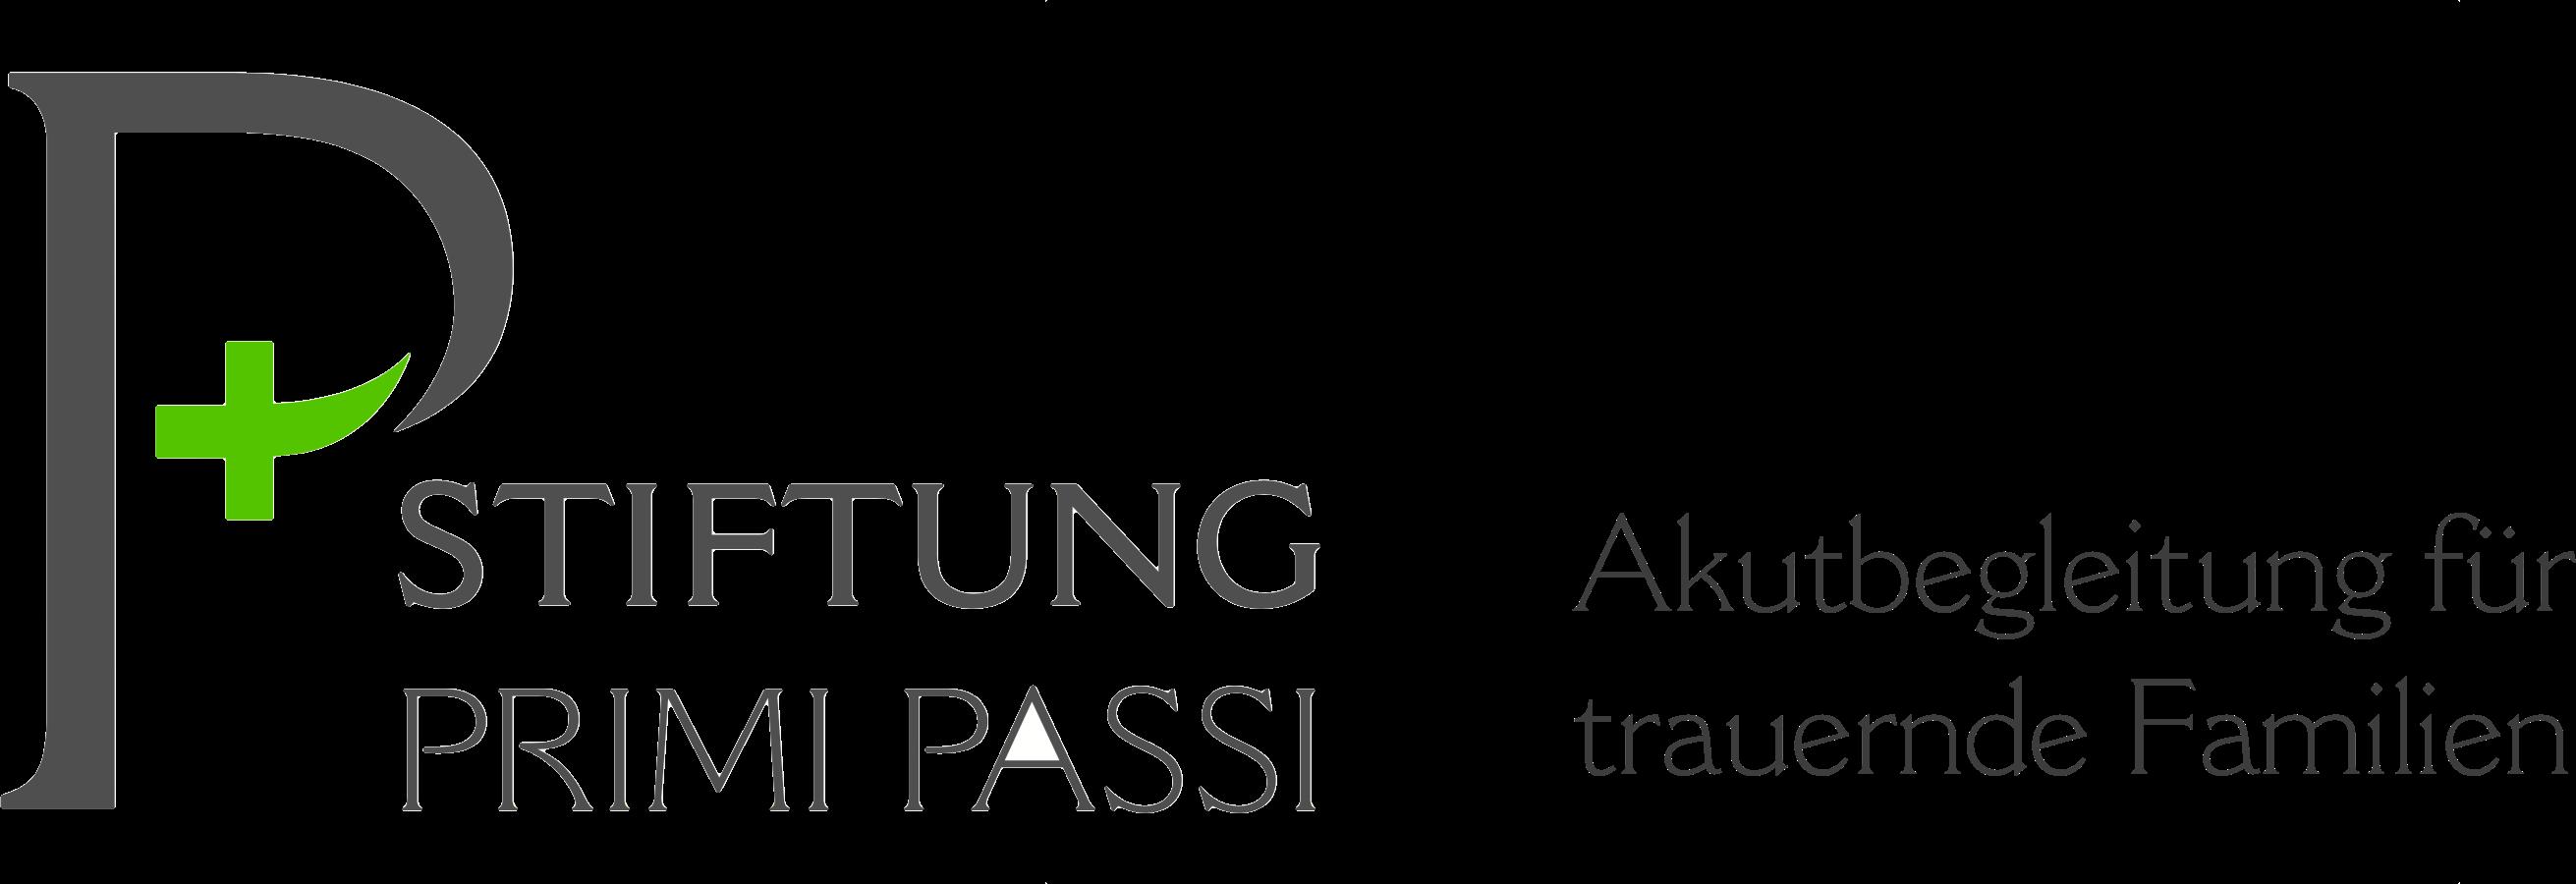 Stiftung Primi Passi